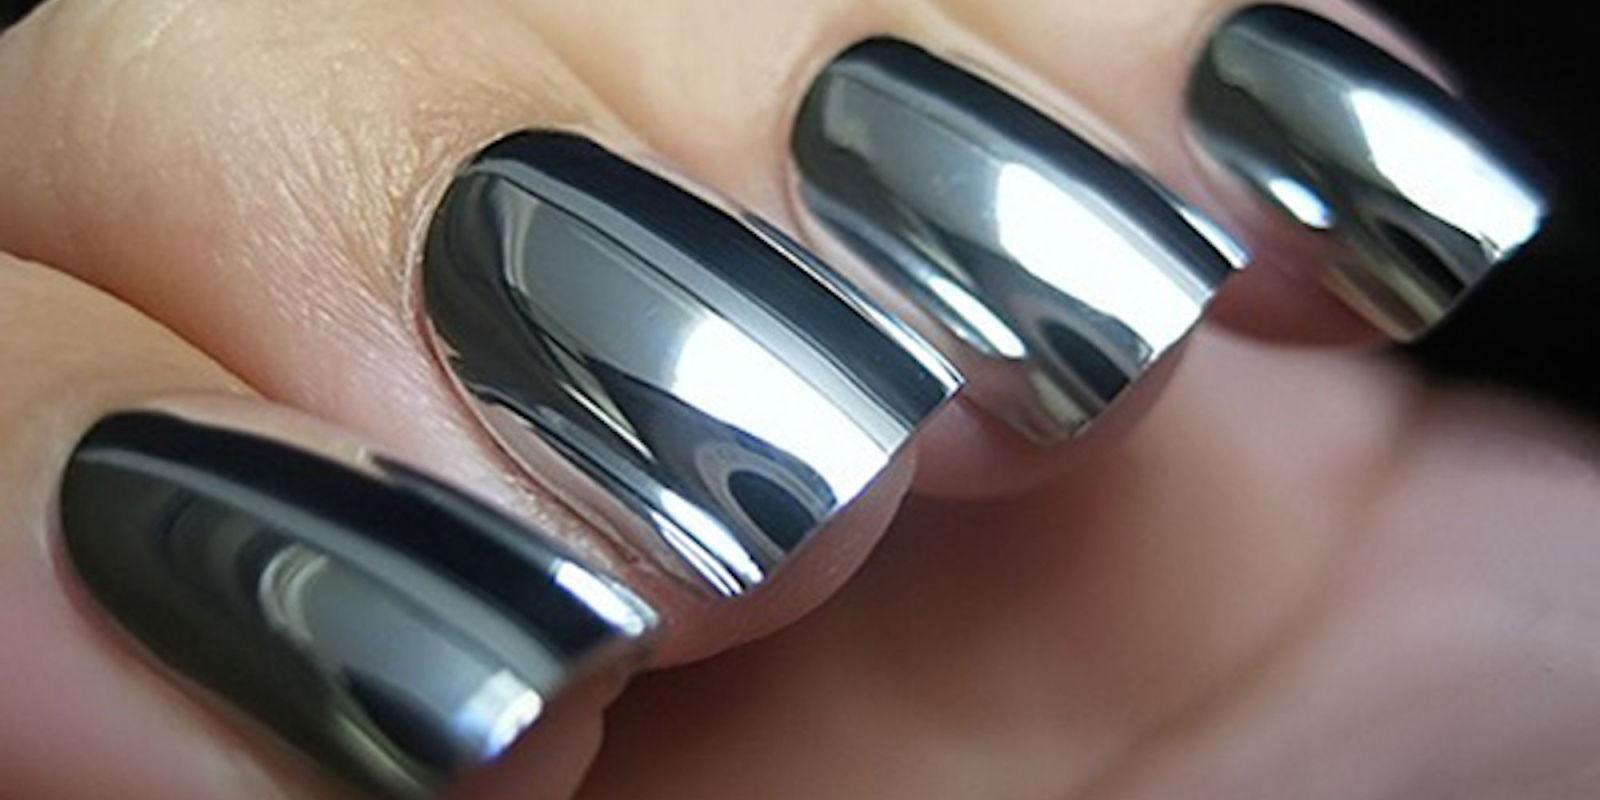 Chrome Nails Czyli Lustro Na Paznokciach Piwnooka